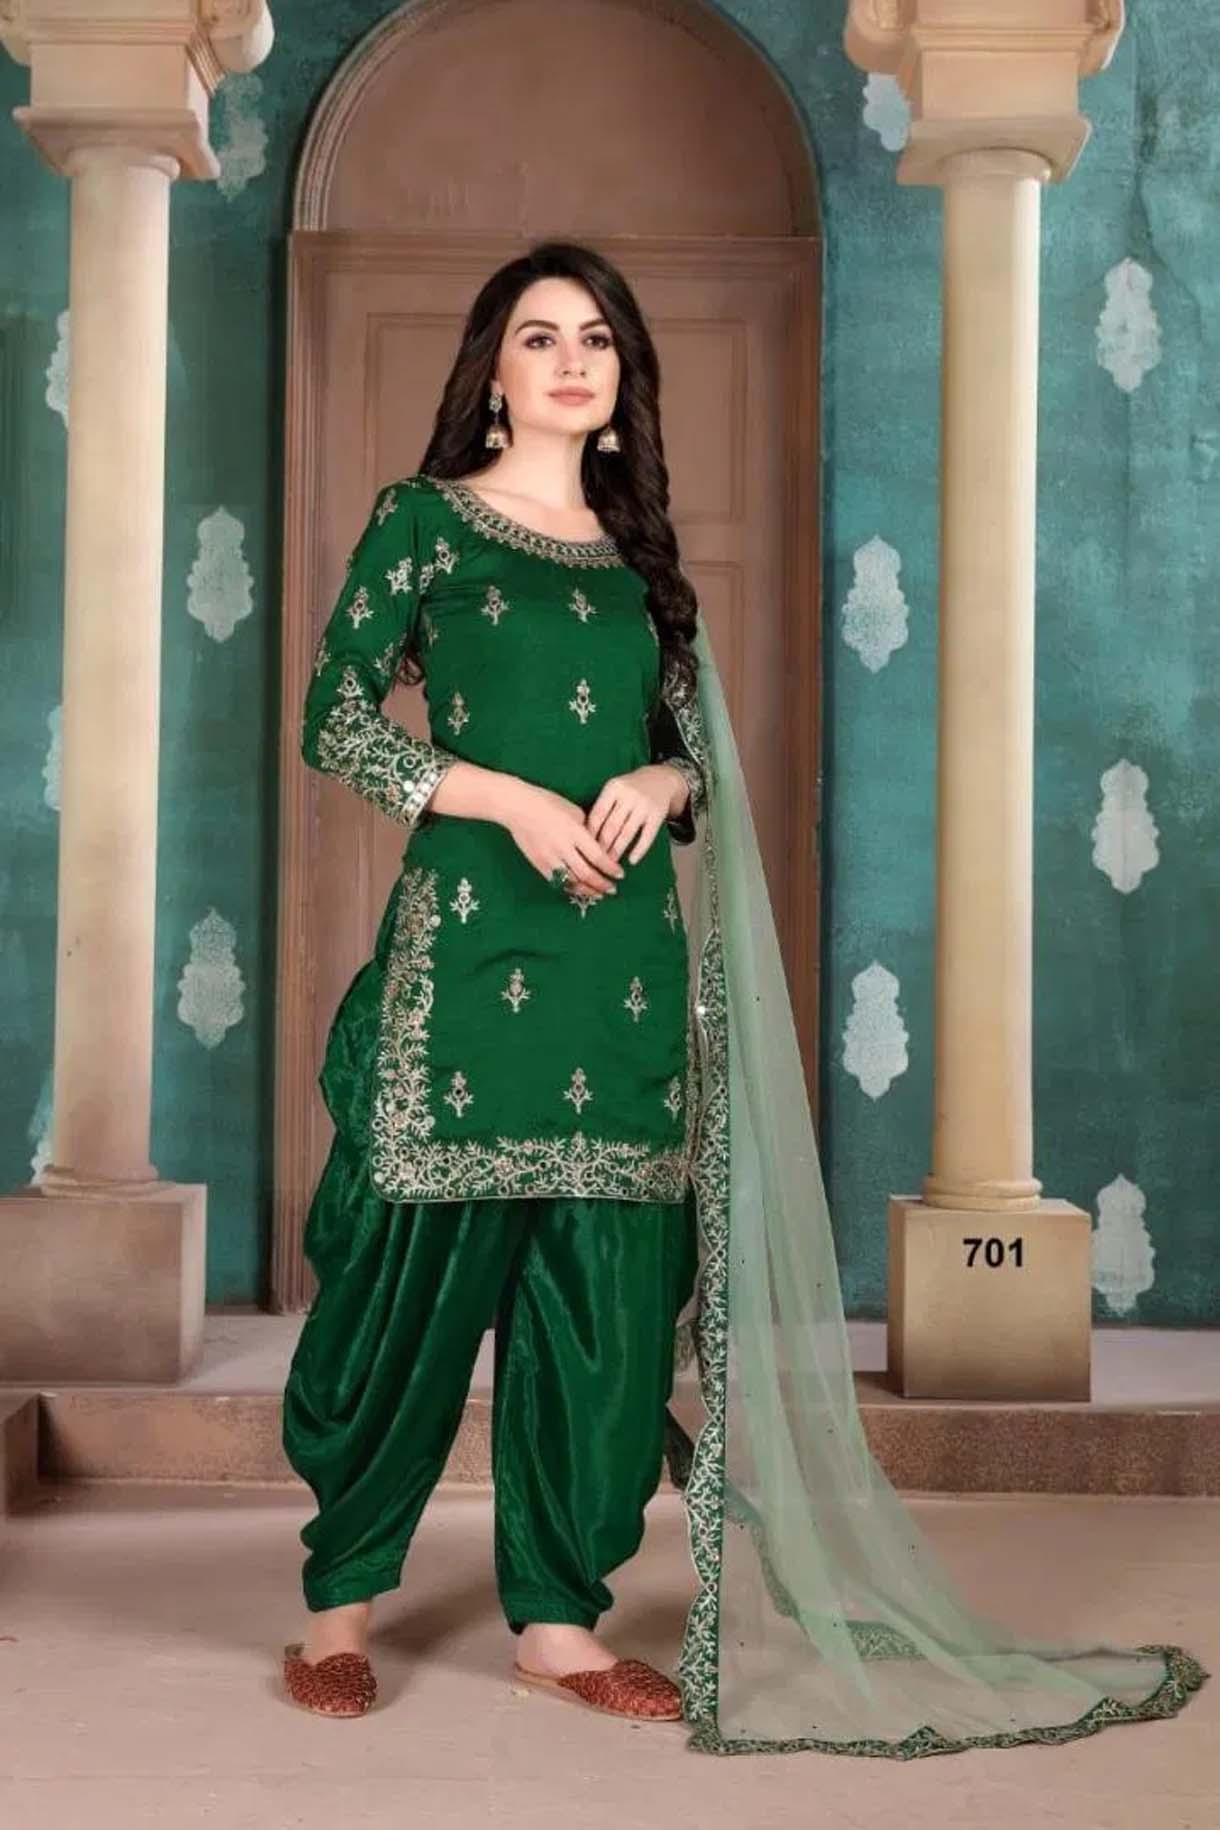 Greem Colour Patiala Salwar Suit Latest Design